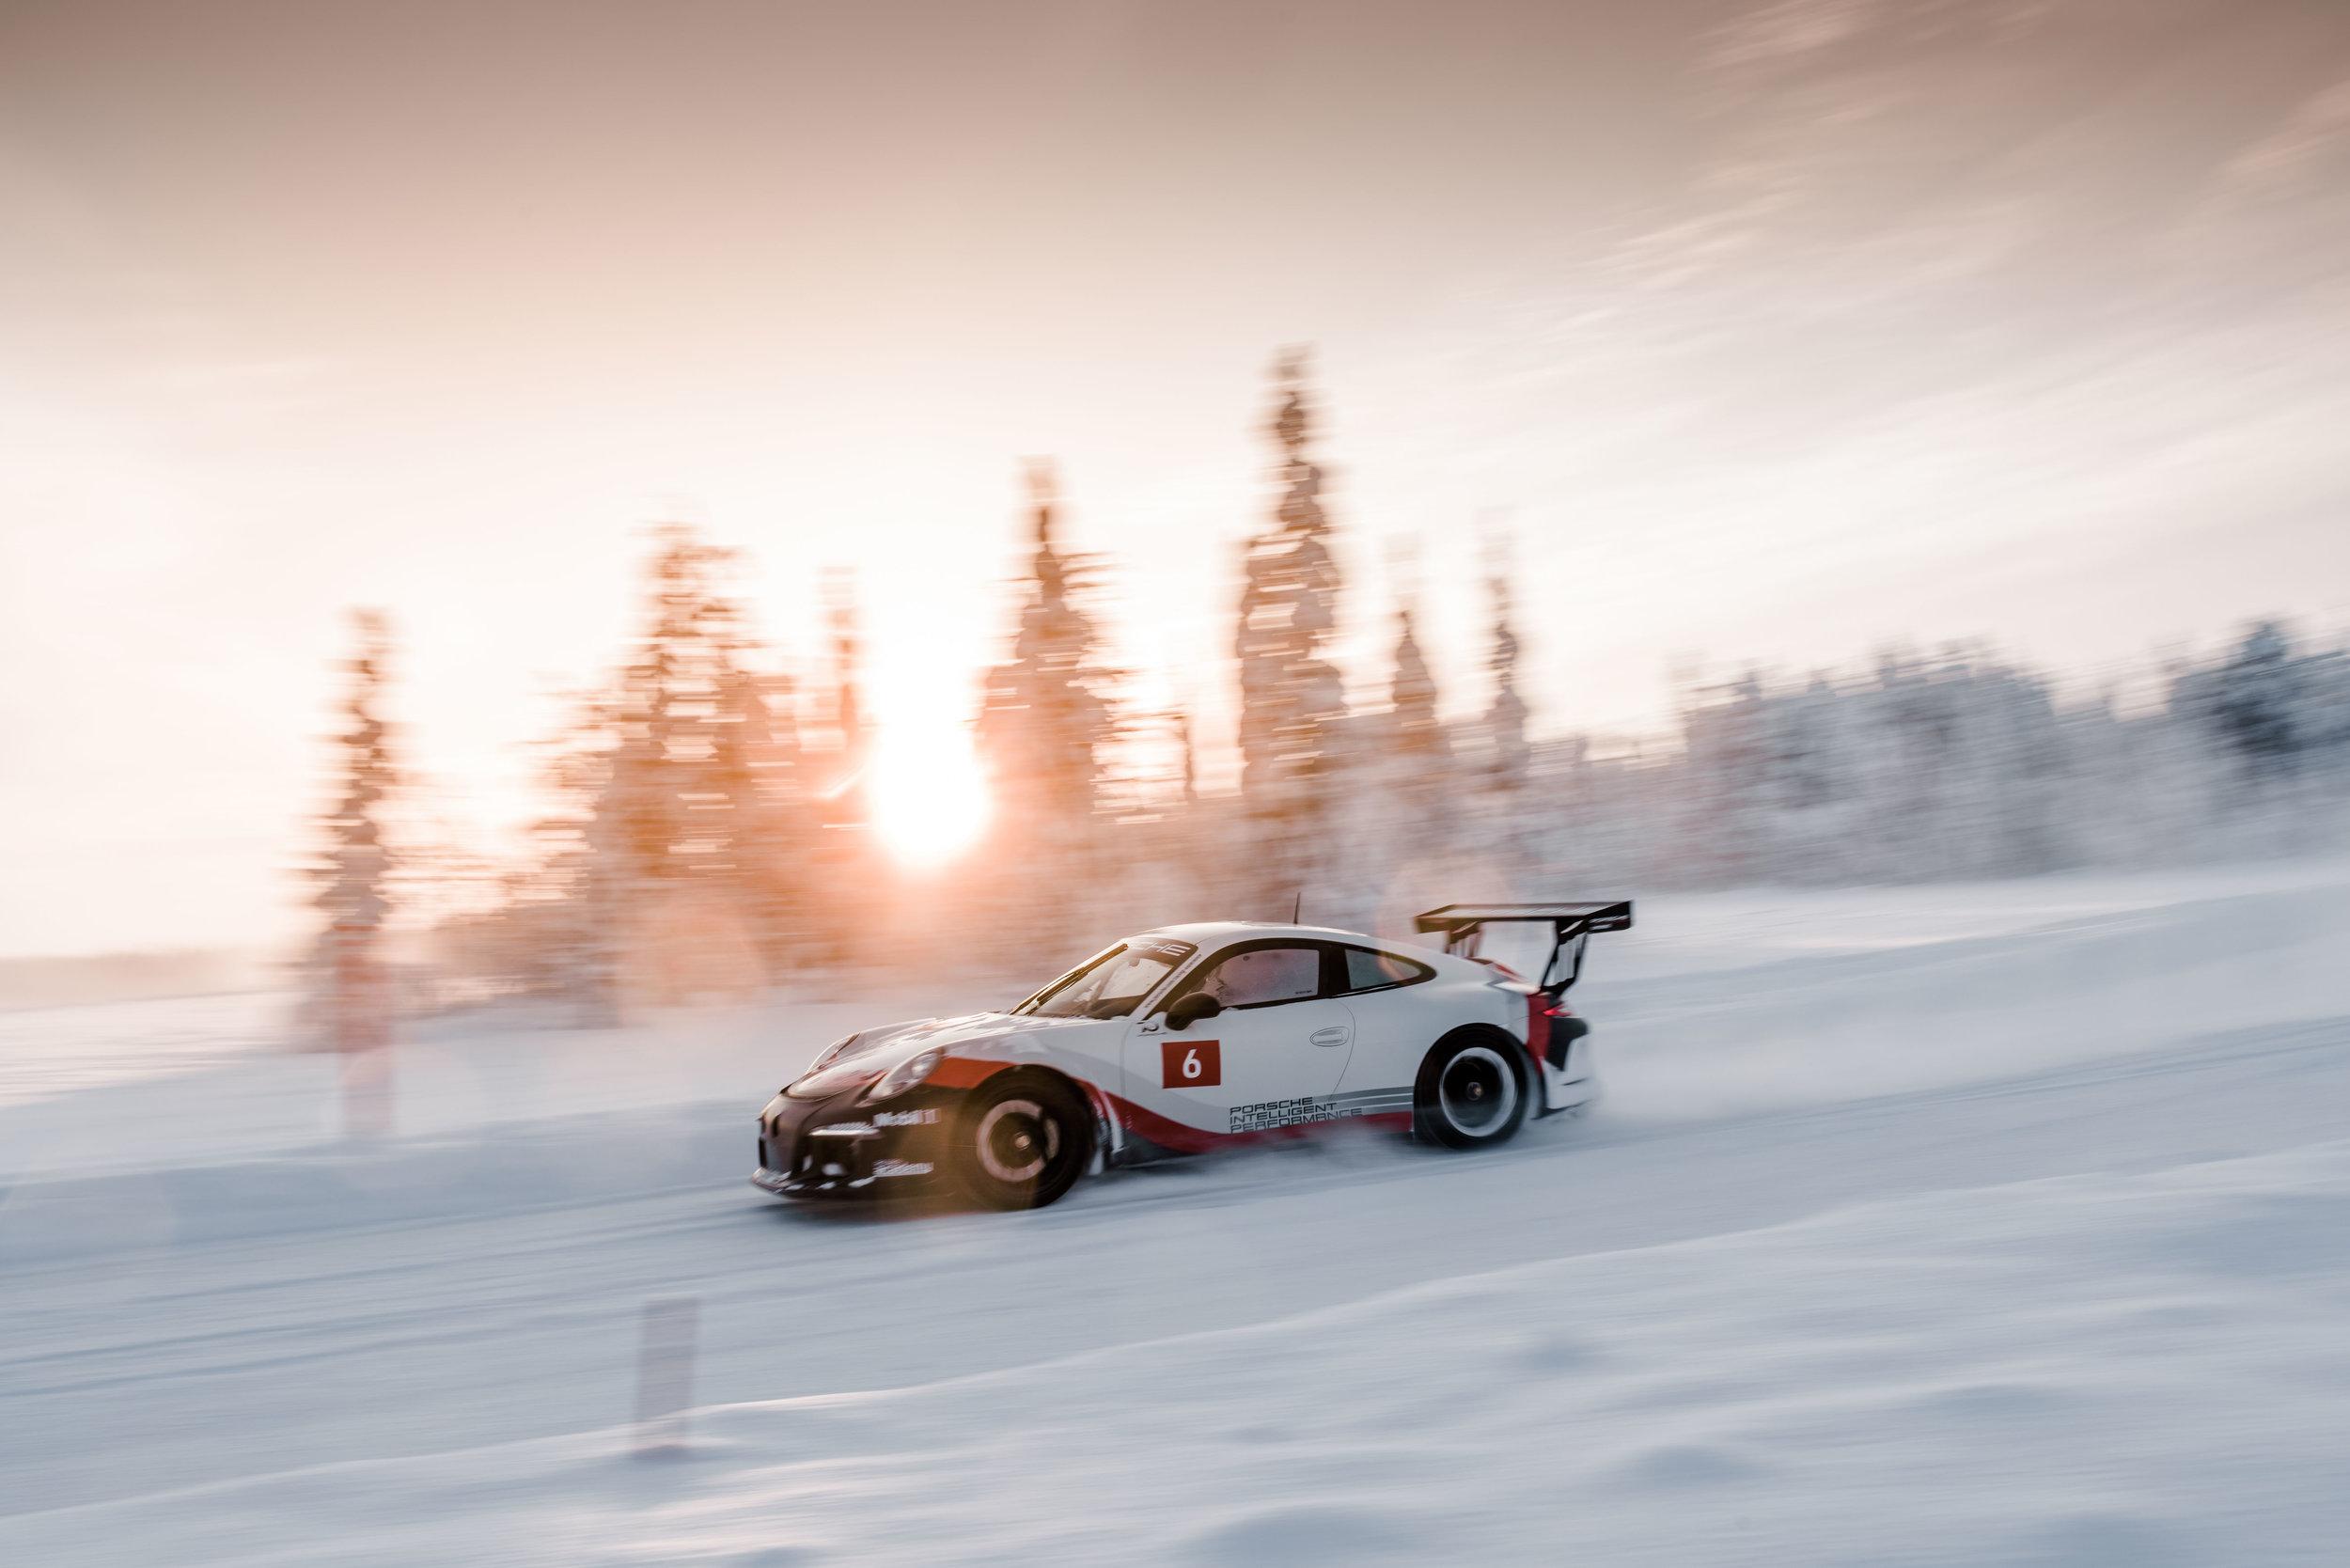 Porsche Ice Experience on Ice_30_01_2019_1206_175797.jpg